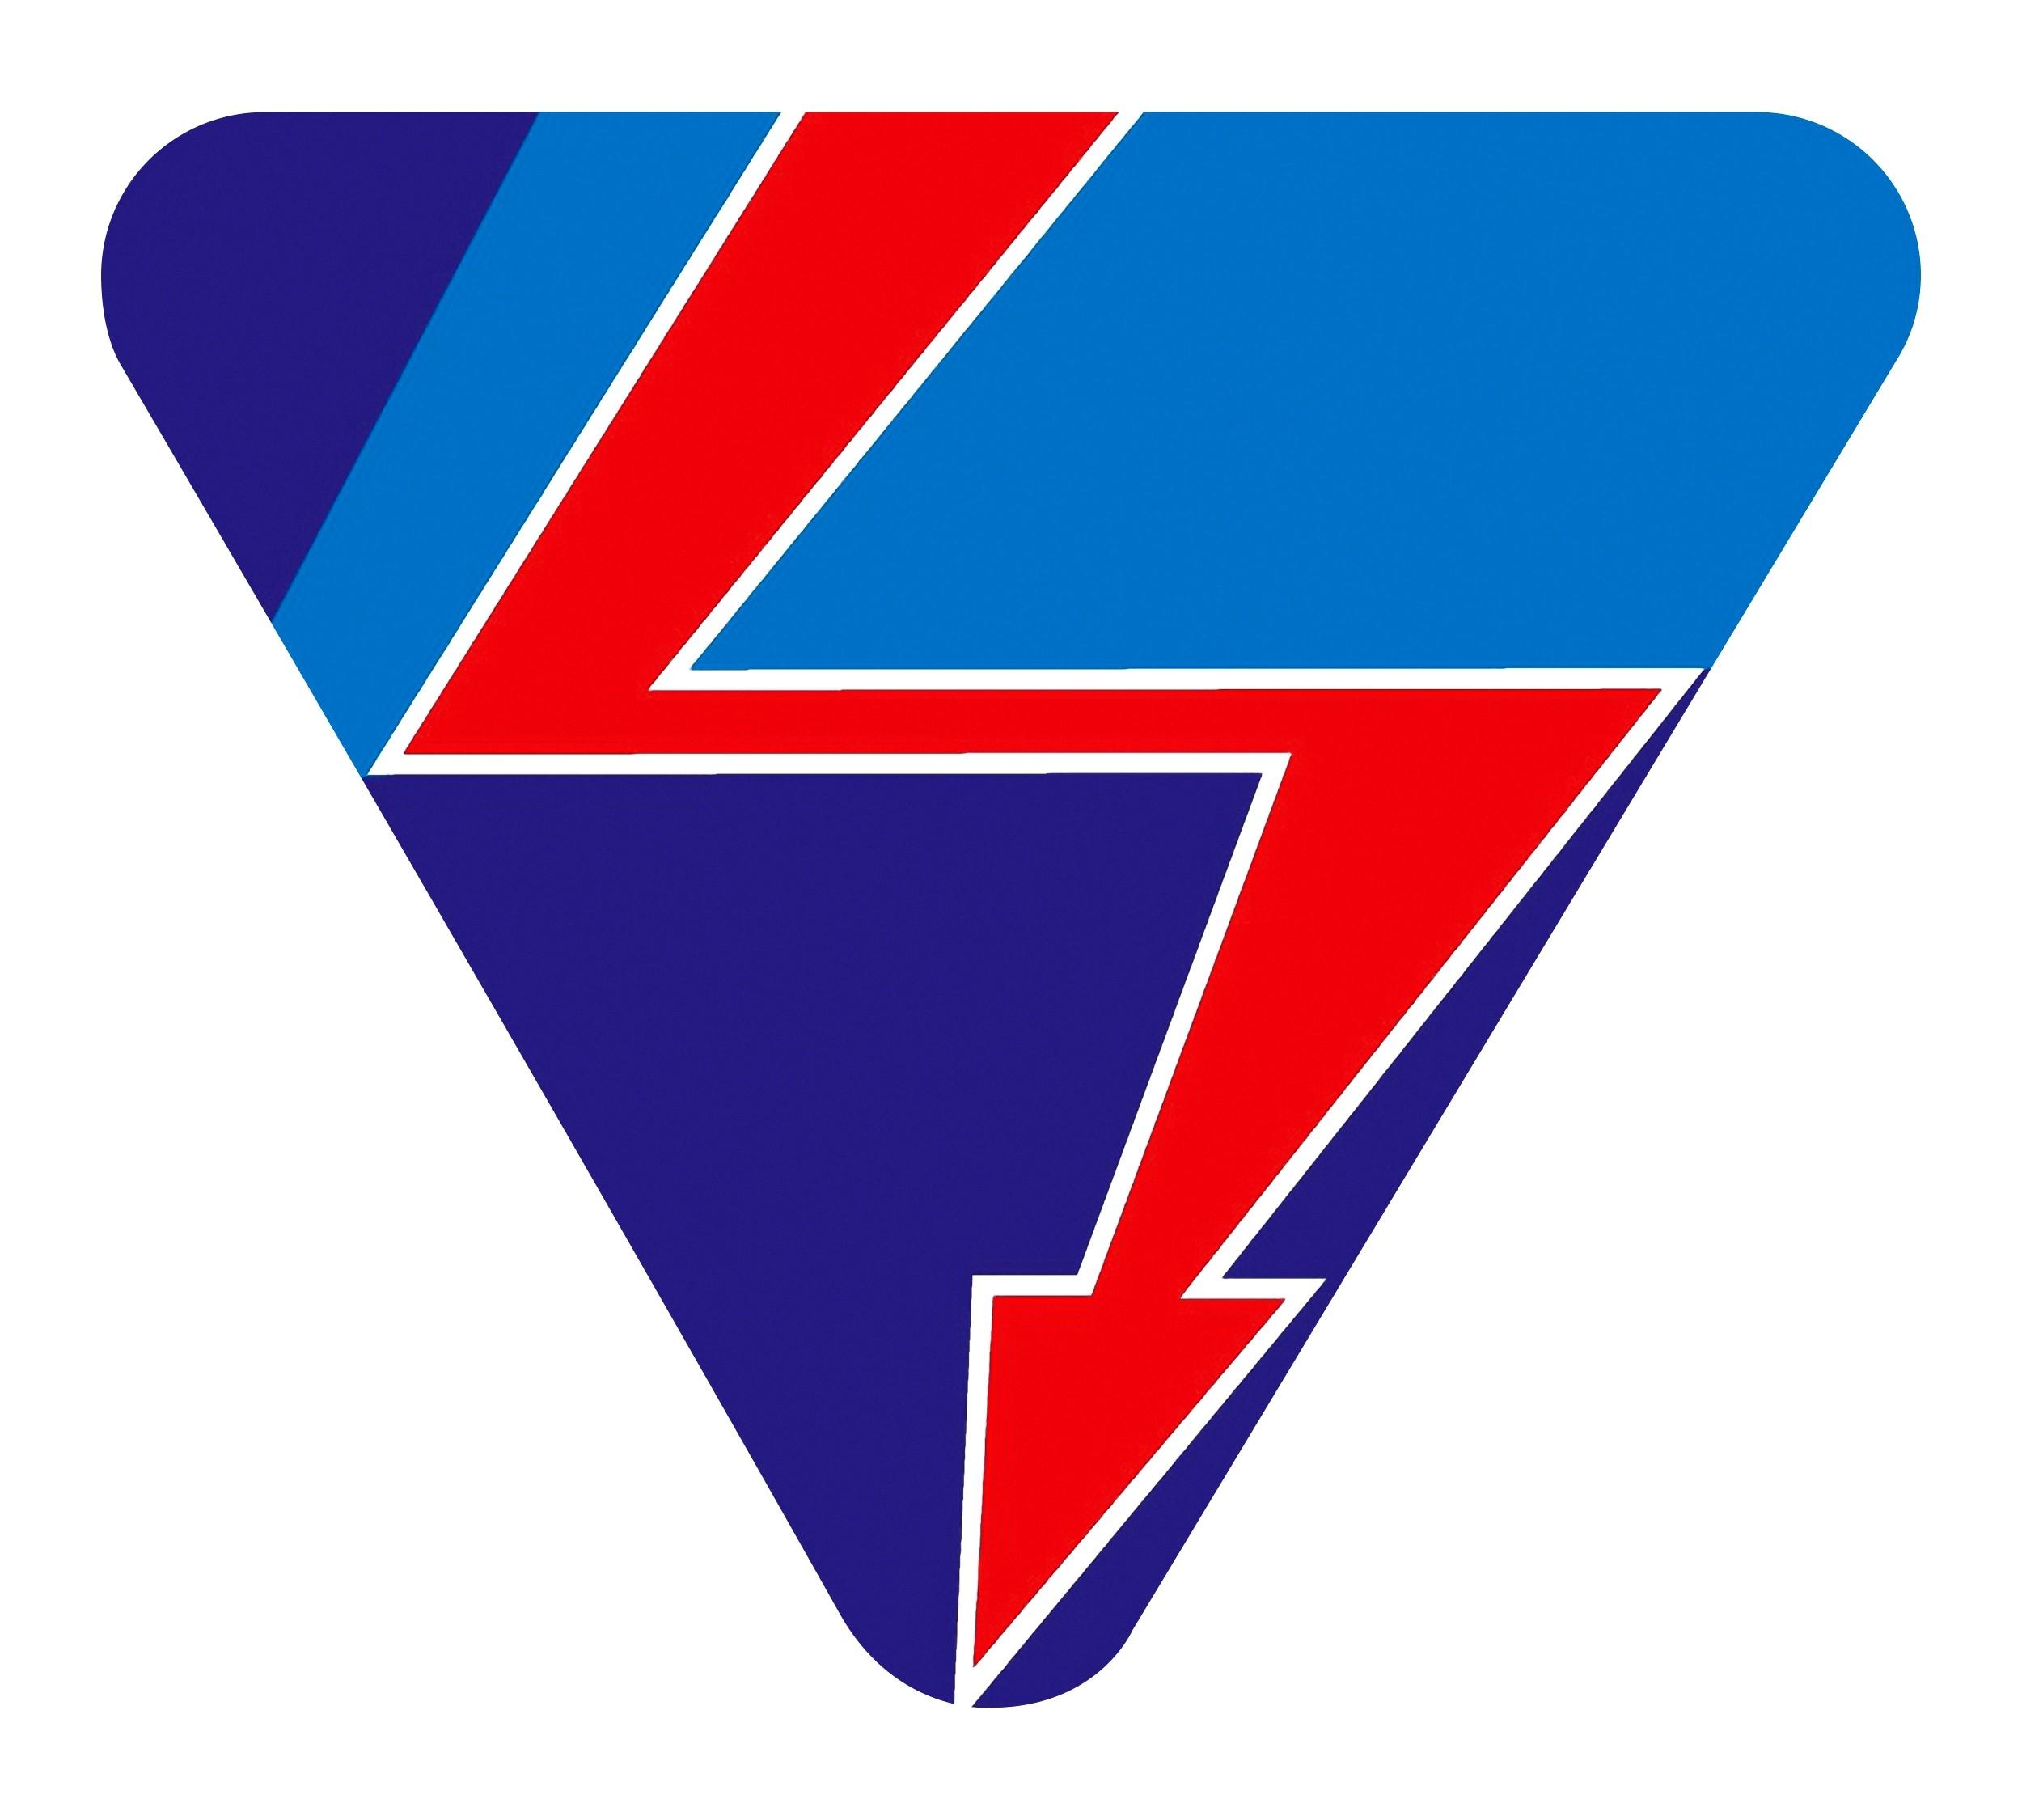 Autocollant Fleuve principal interrupteur triangulaire 70 x 80 mm – Bild 1